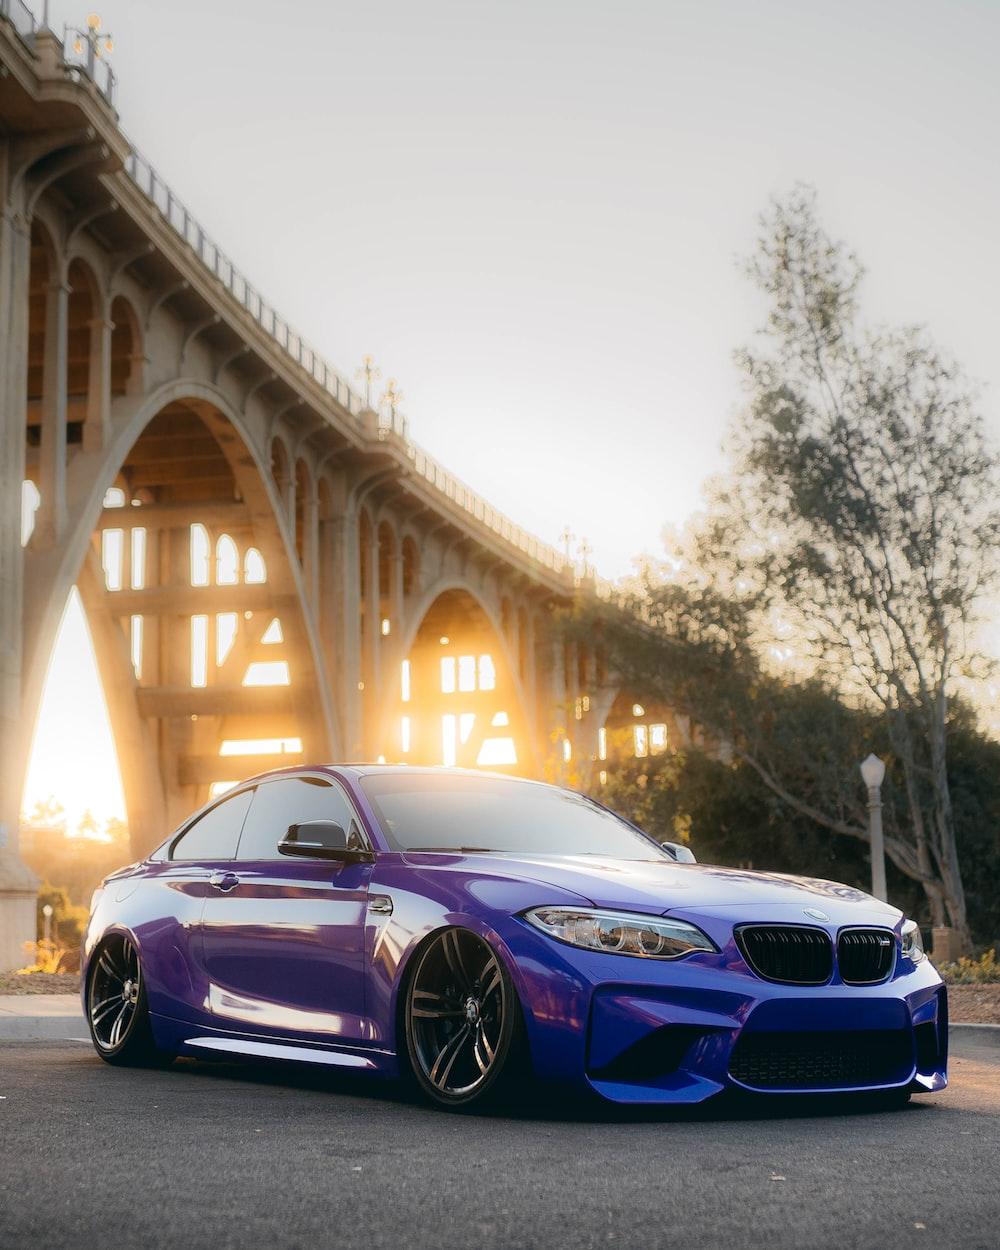 purple bmw m 3 coupe on bridge during daytime